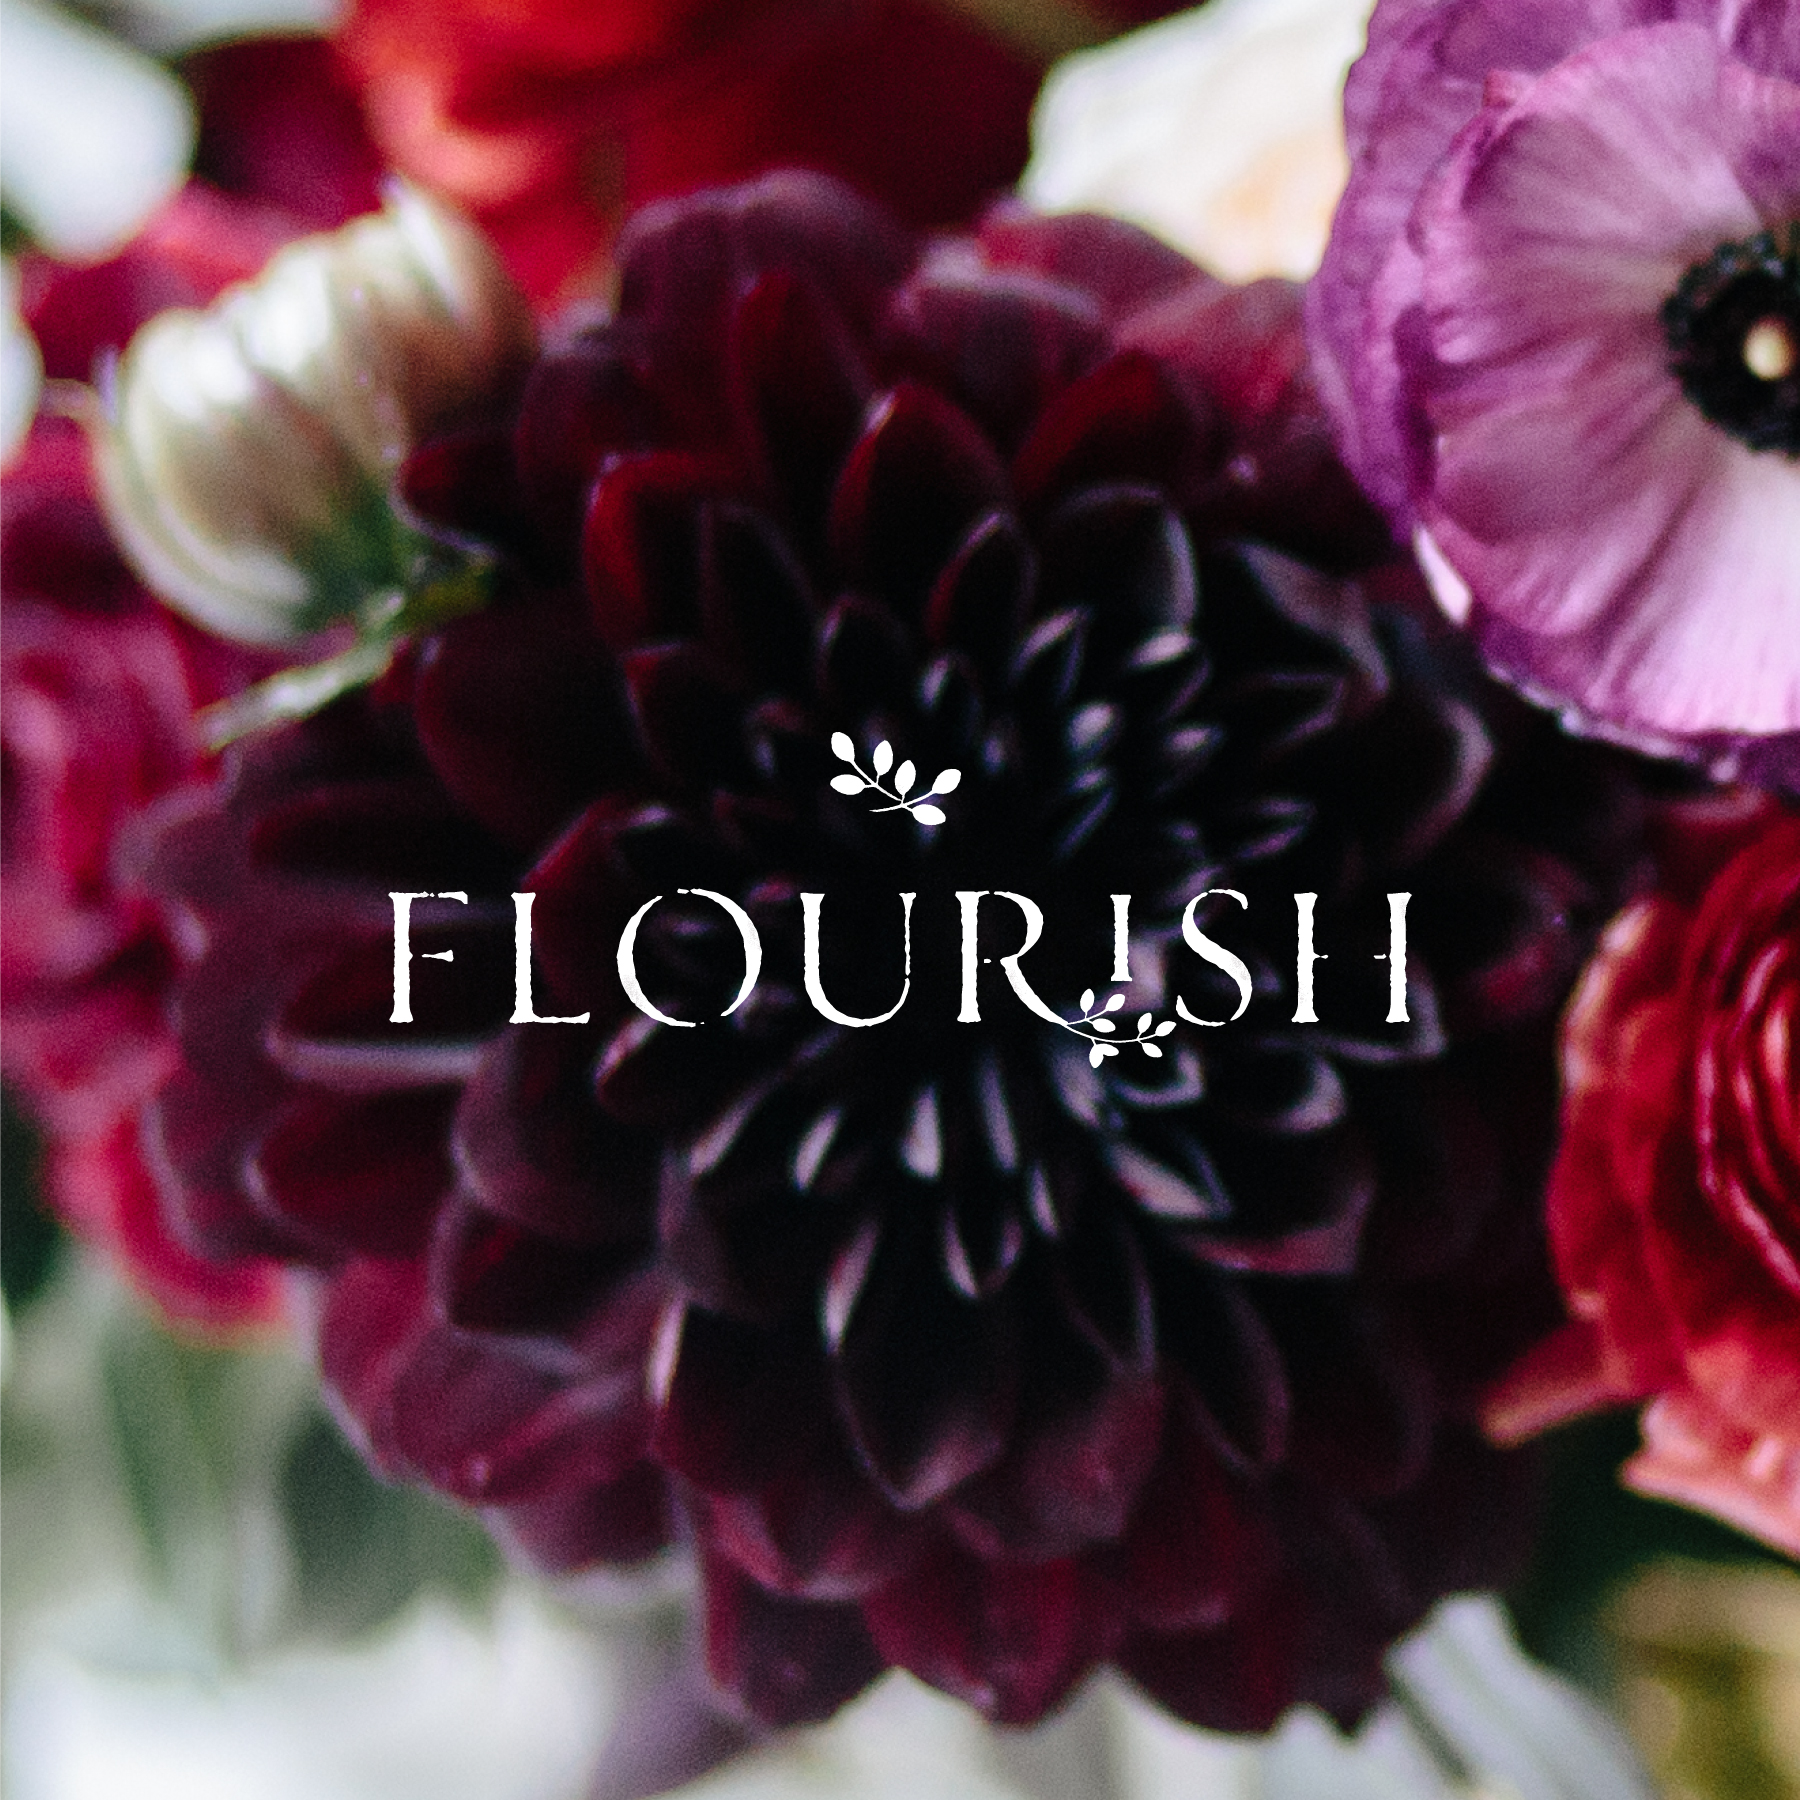 Flourish : Branding, Web design.